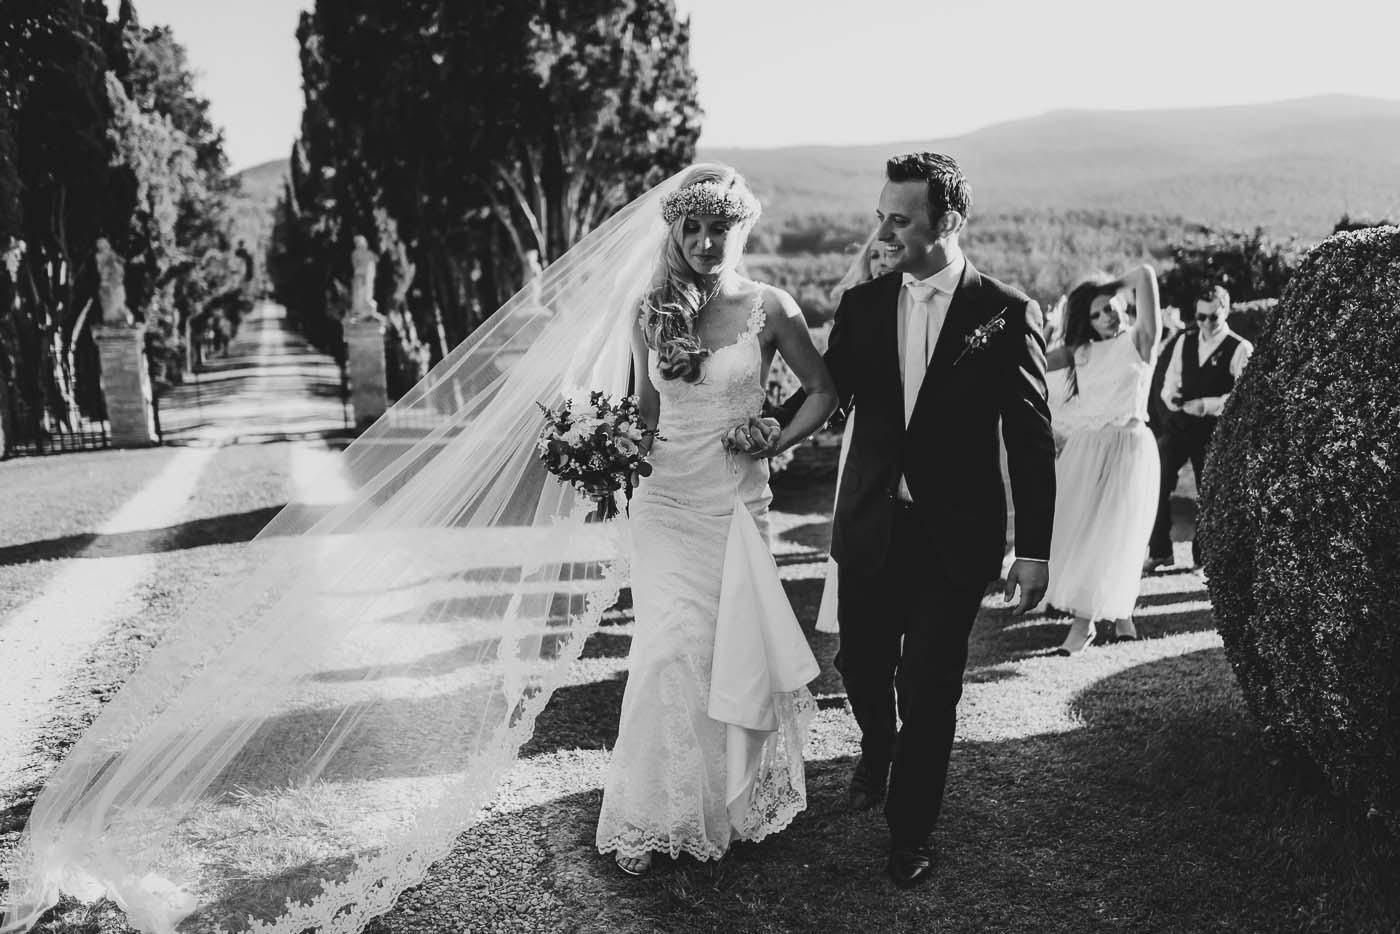 Relaxed-wedding-borgo-stomennano-1113